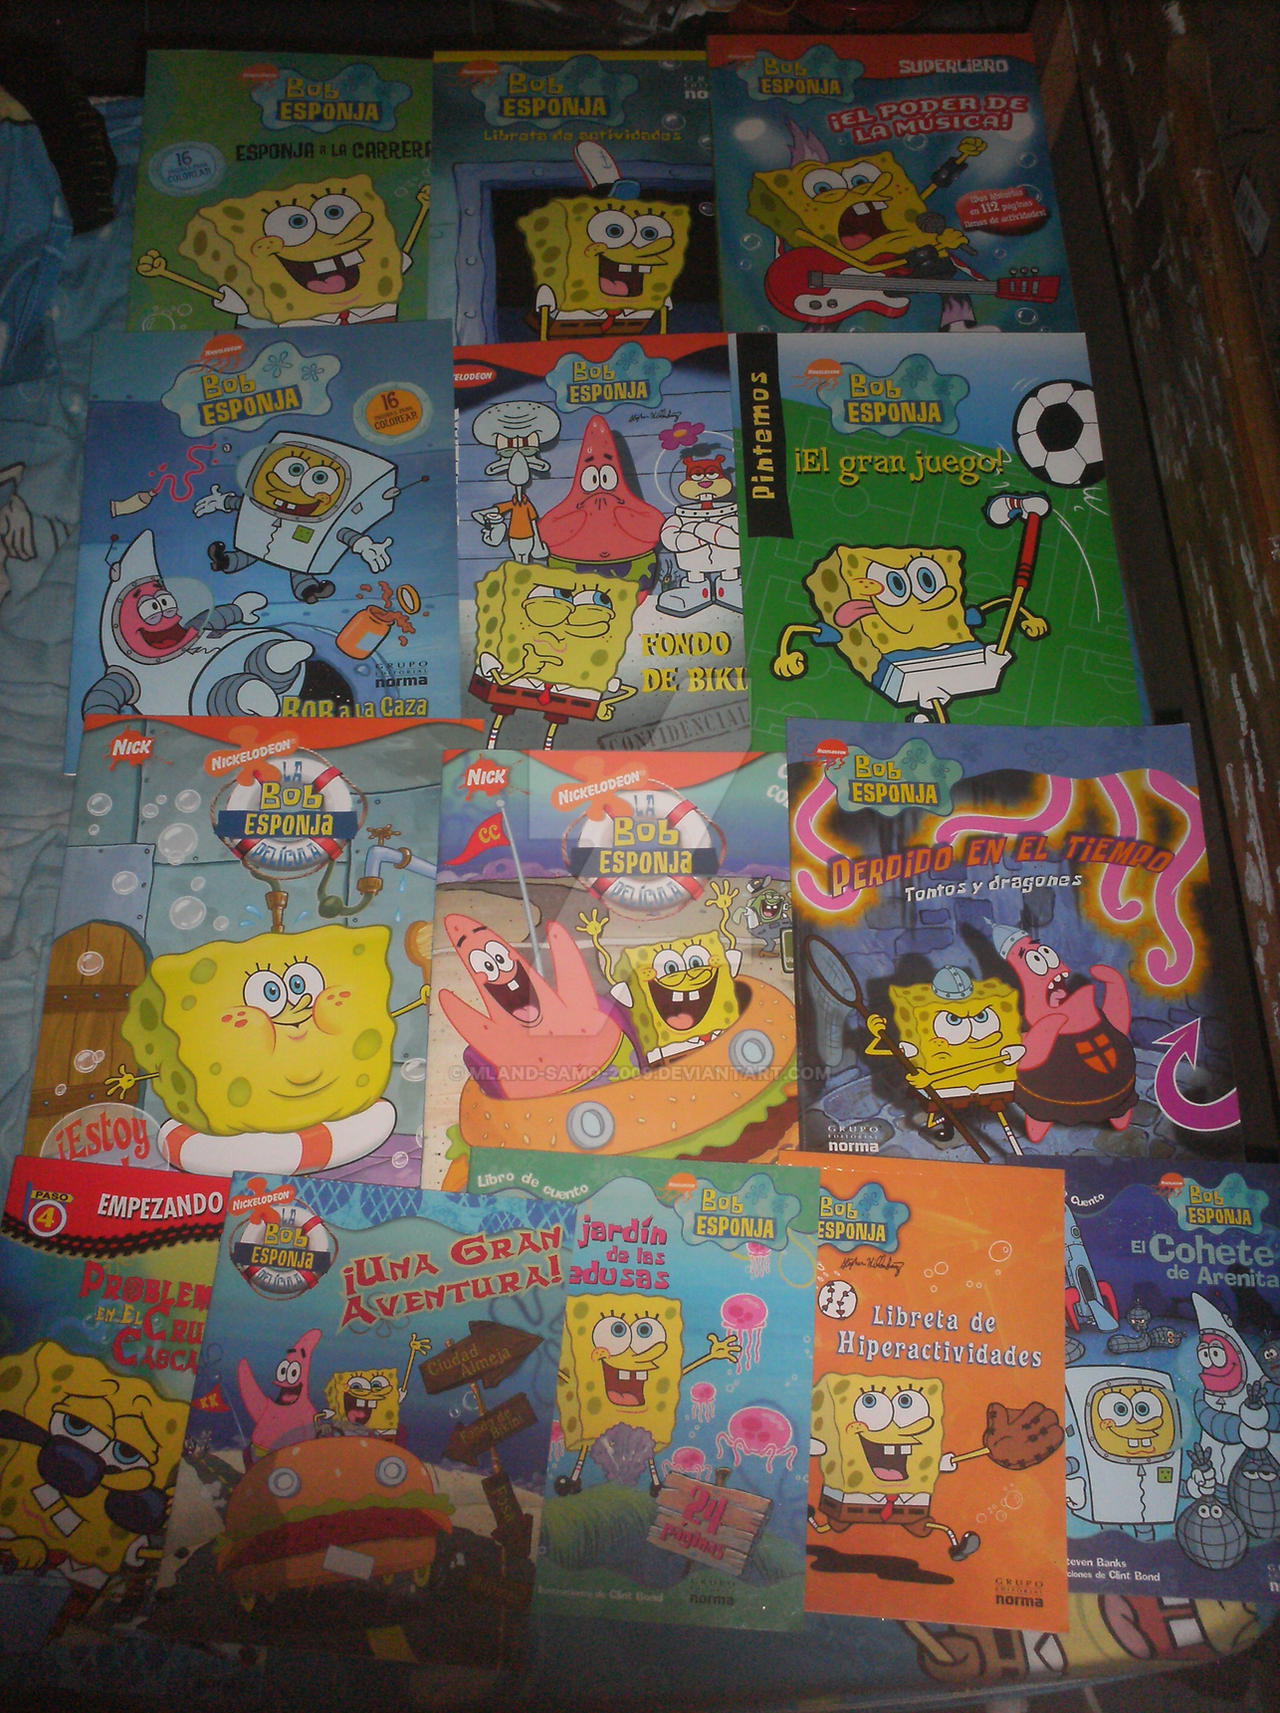 my spongebob books collection by mland samo 2009 on deviantart